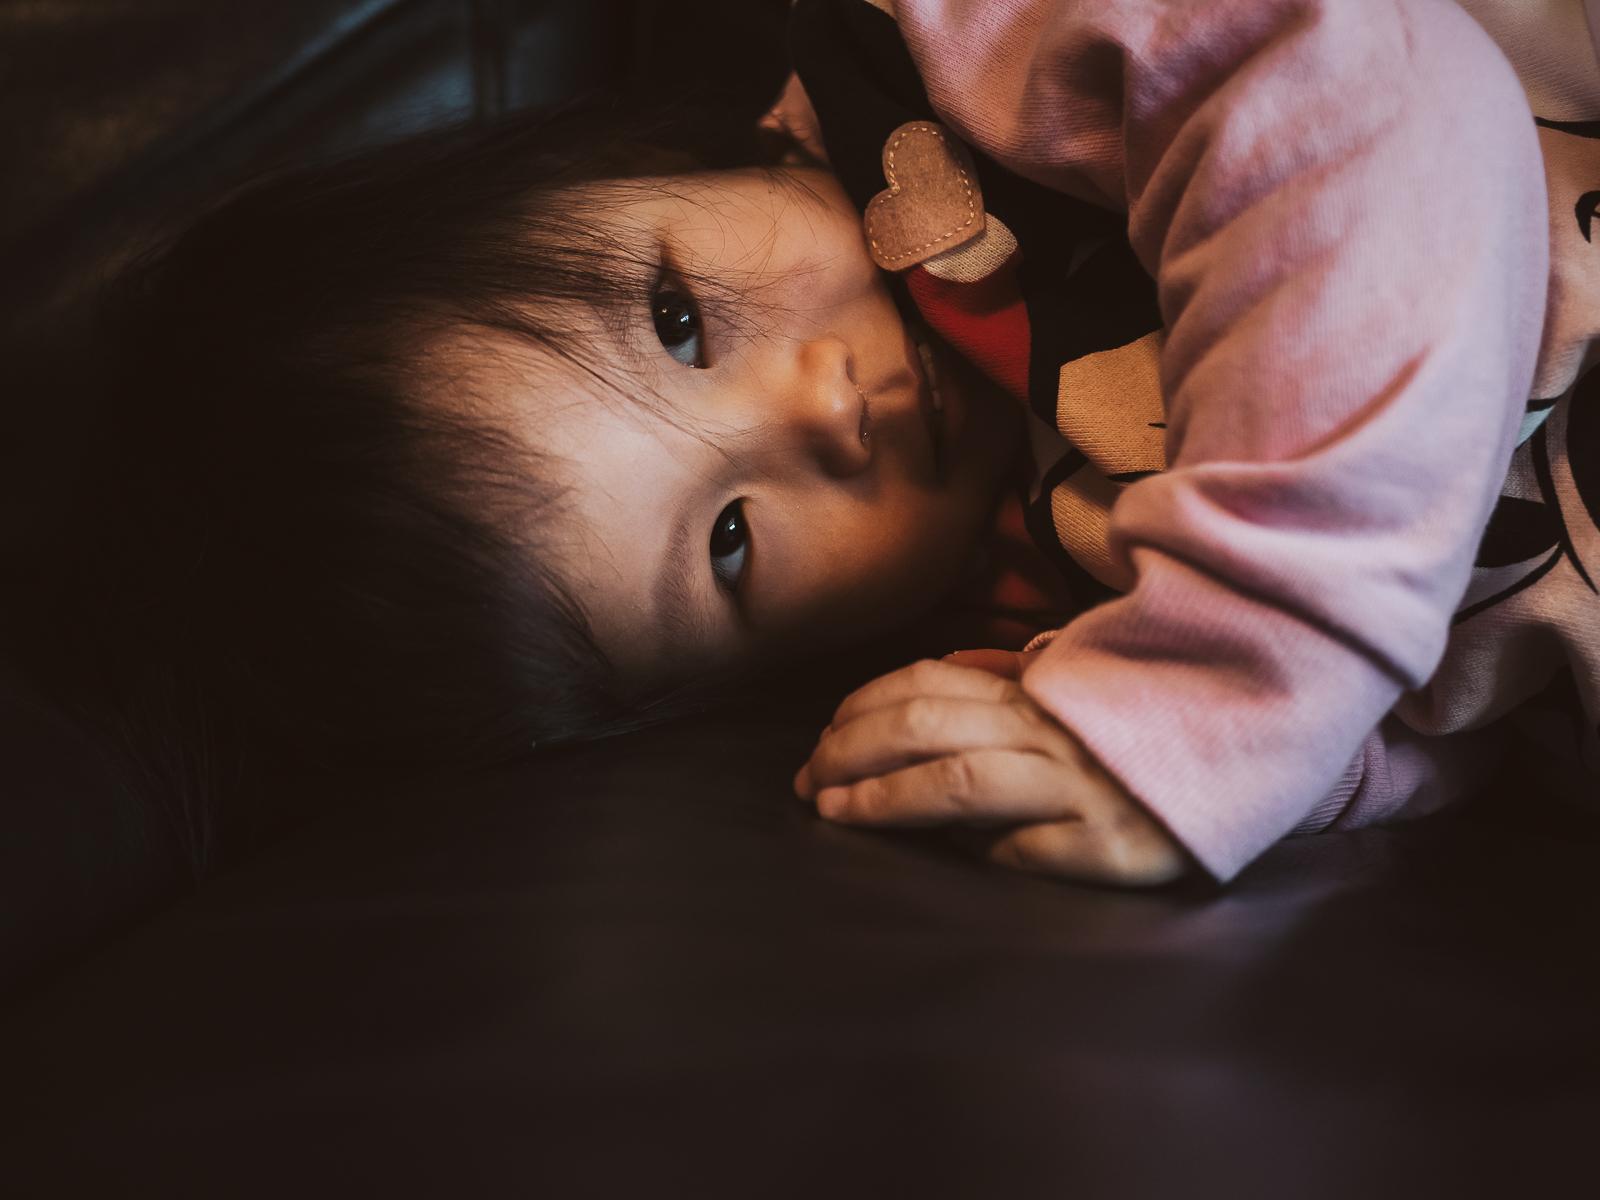 Eiffle Chan Family Portrait - Olympus EMaMarkii2512 - Yes! Please Enjoy by Fanning Tseng-9.jpg